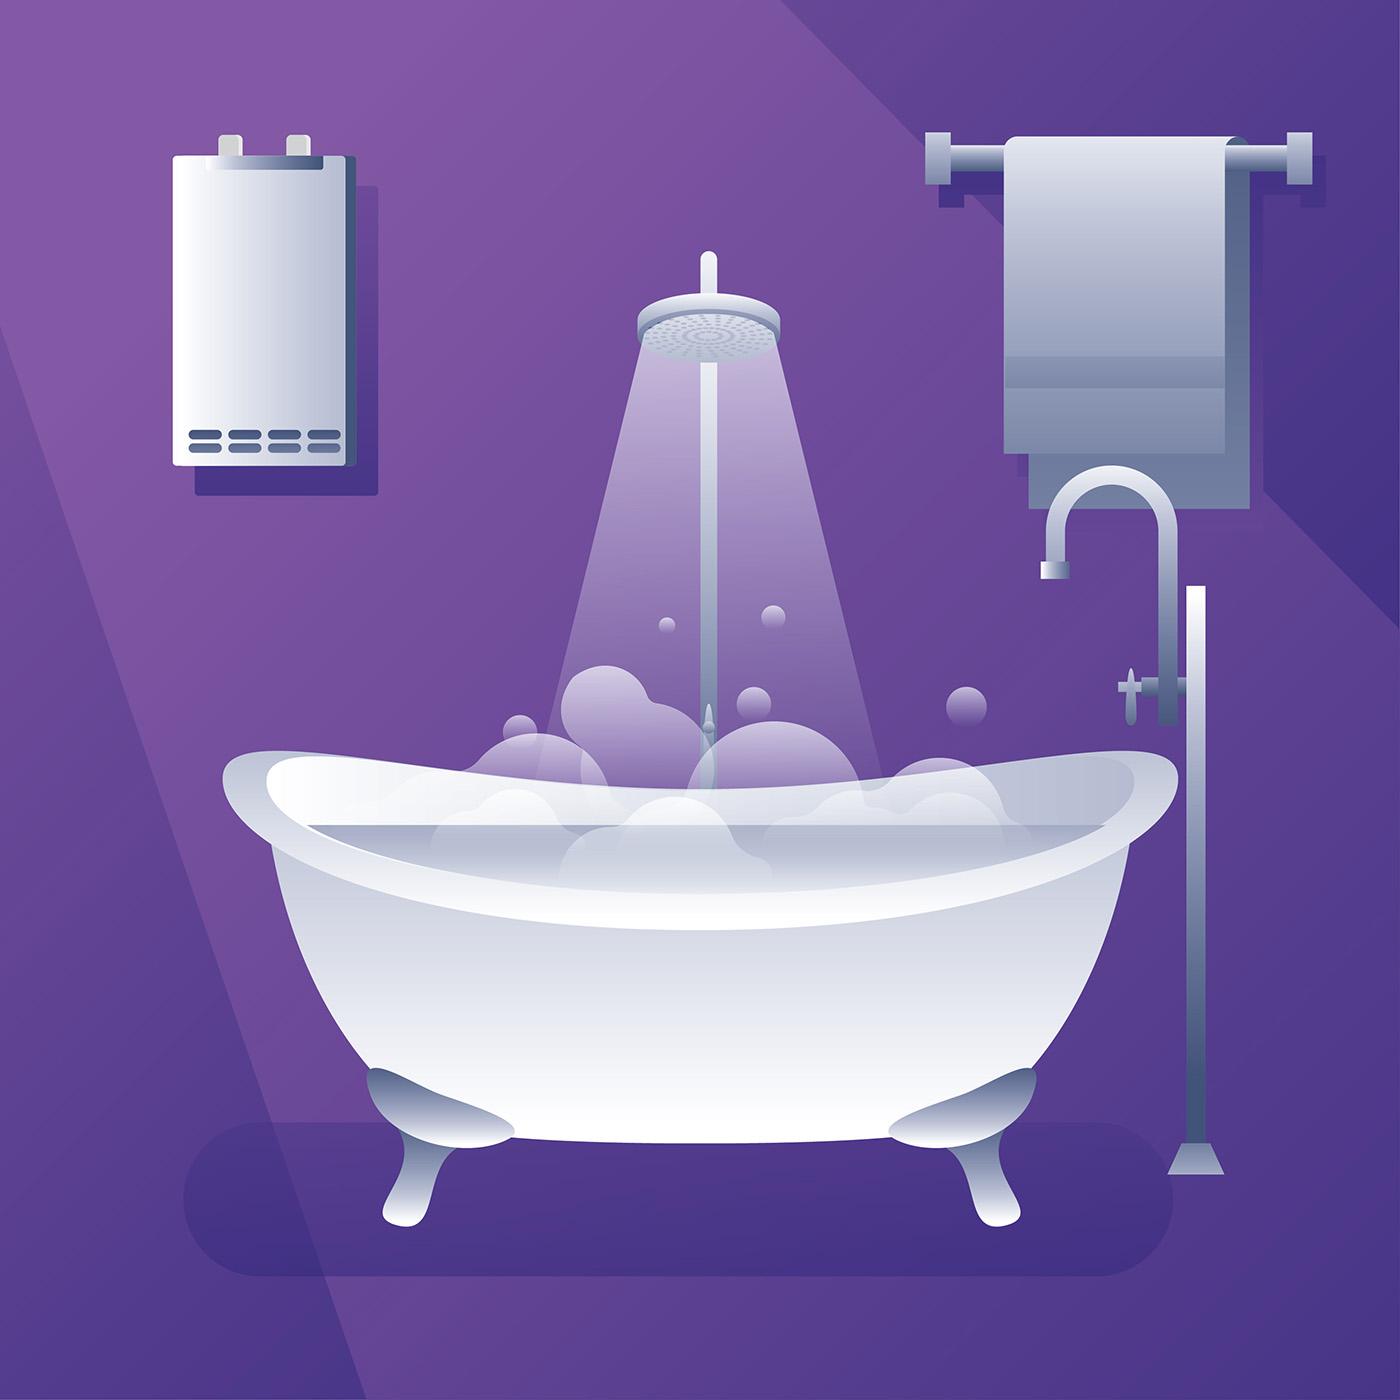 Water Heater Bath Tub Vector - Download Free Vector Art, Stock ...